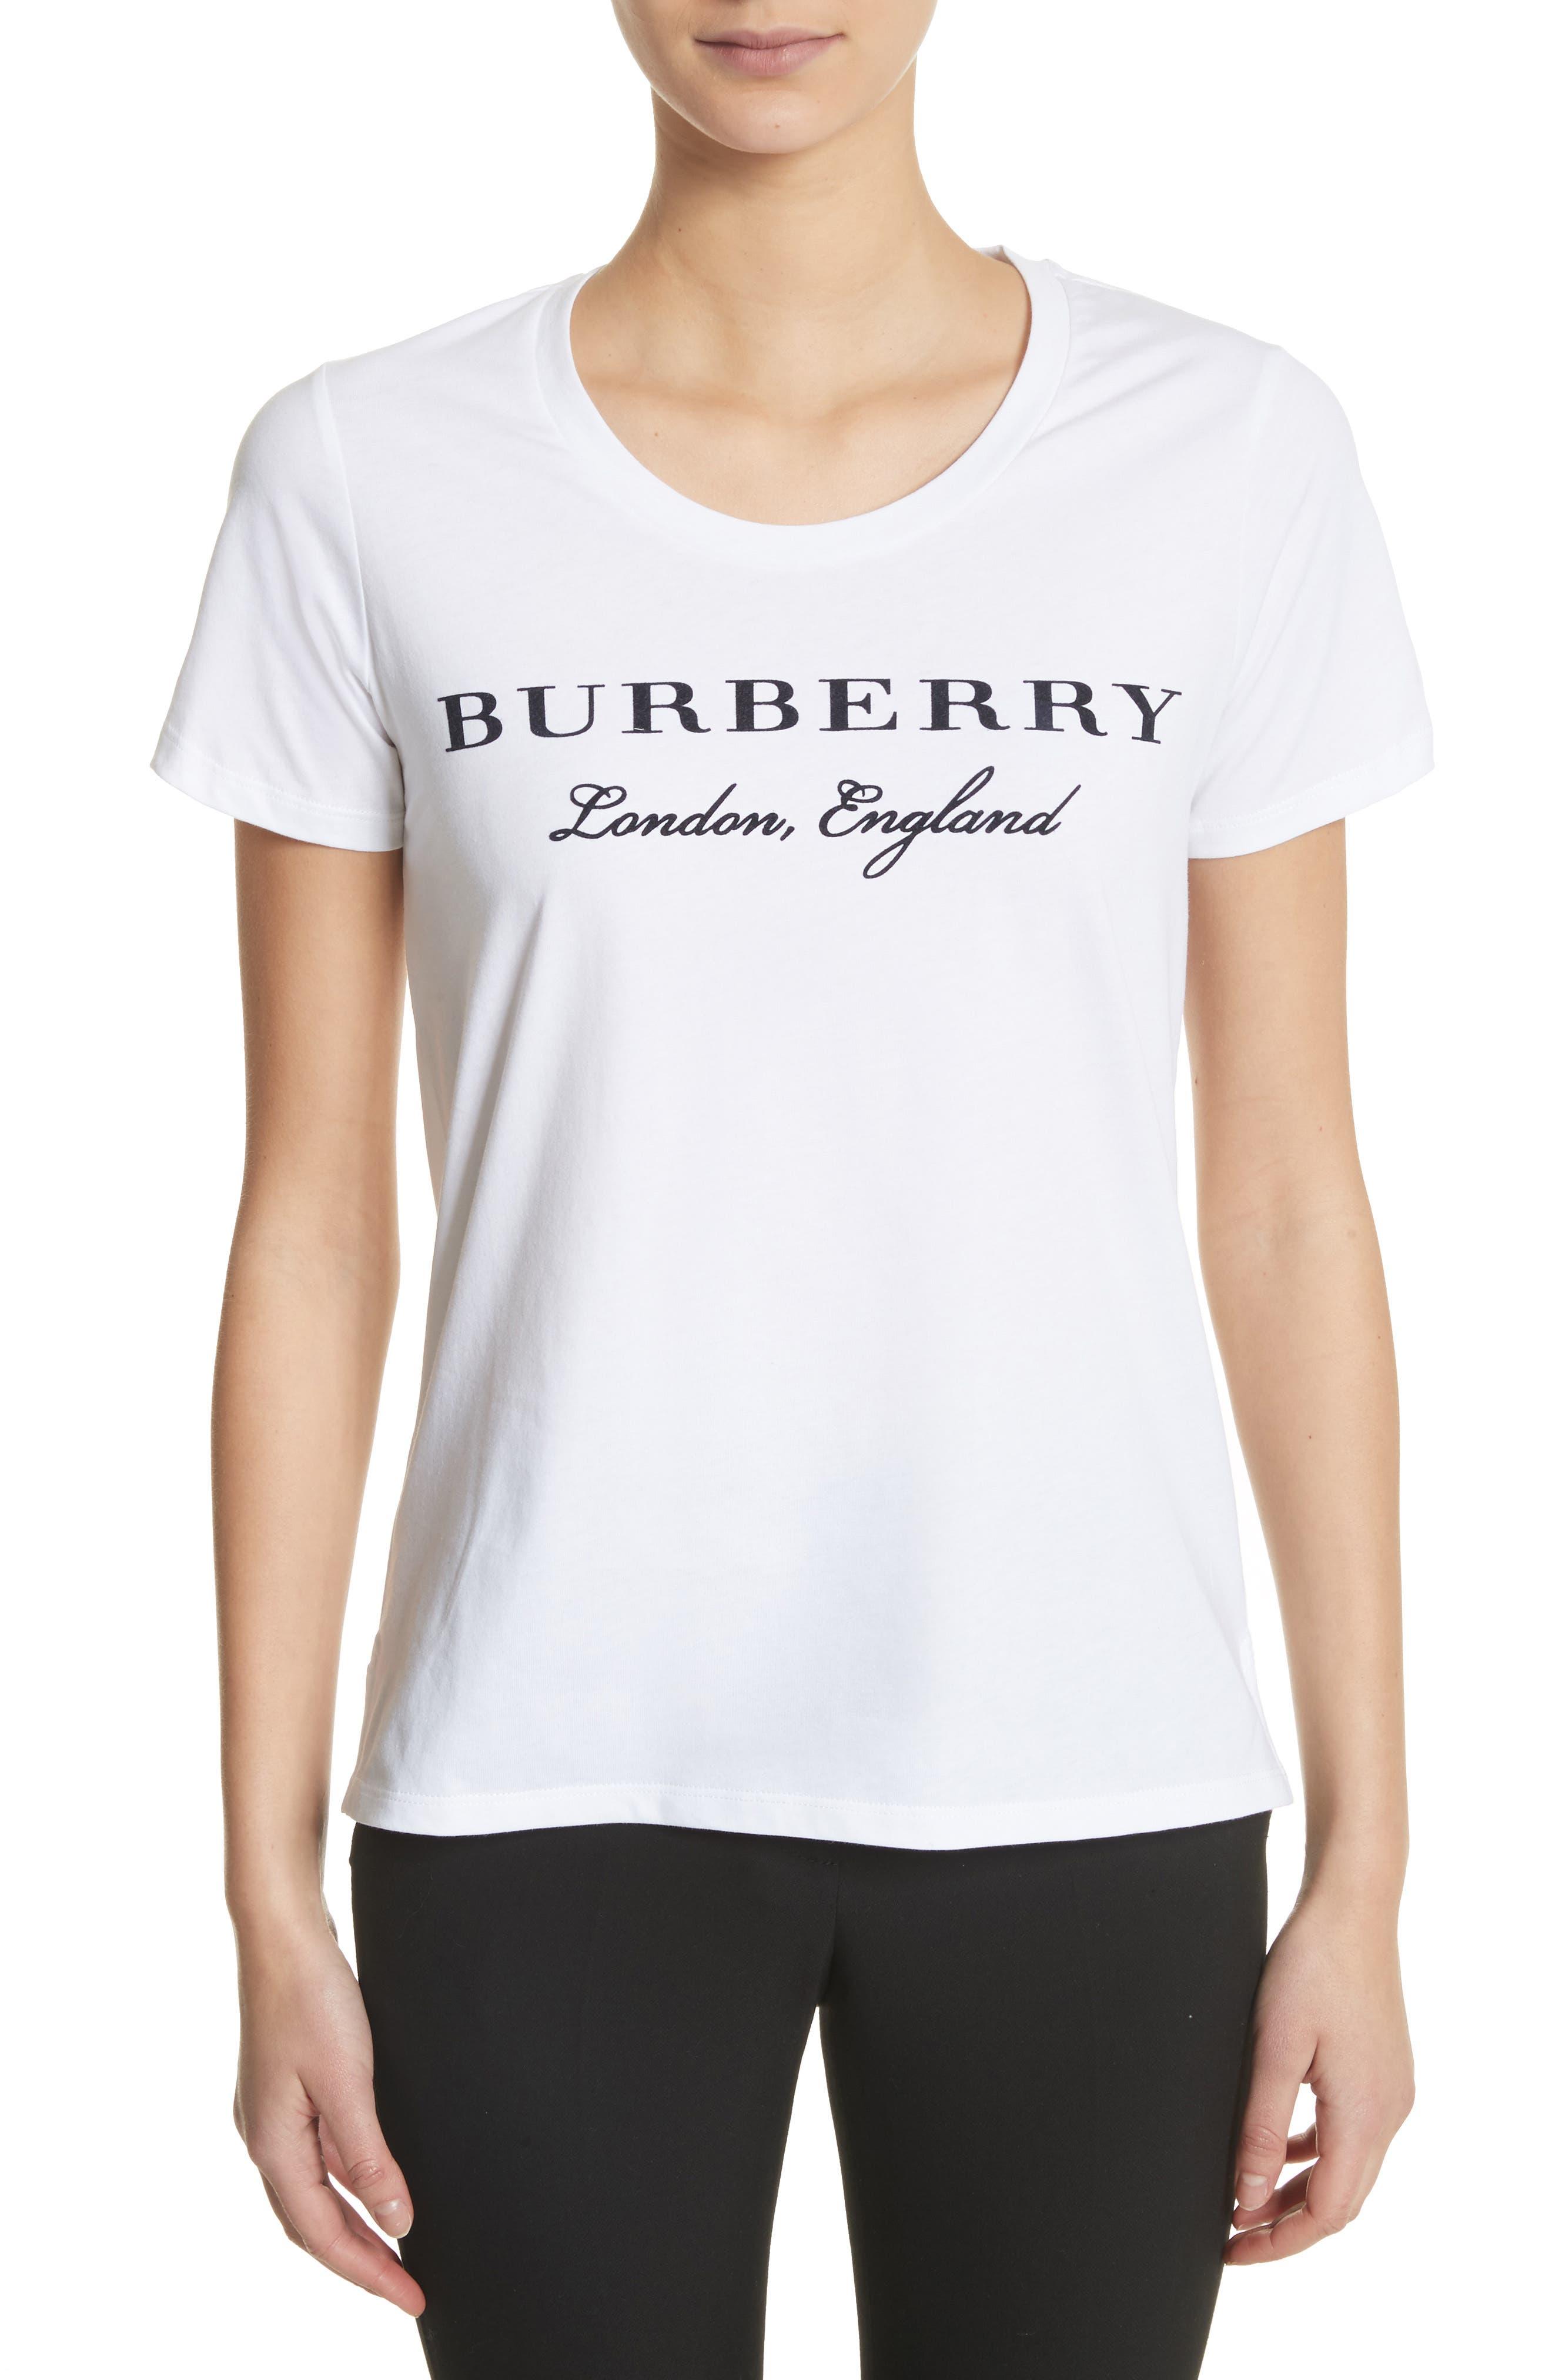 Burberry Mera Tee